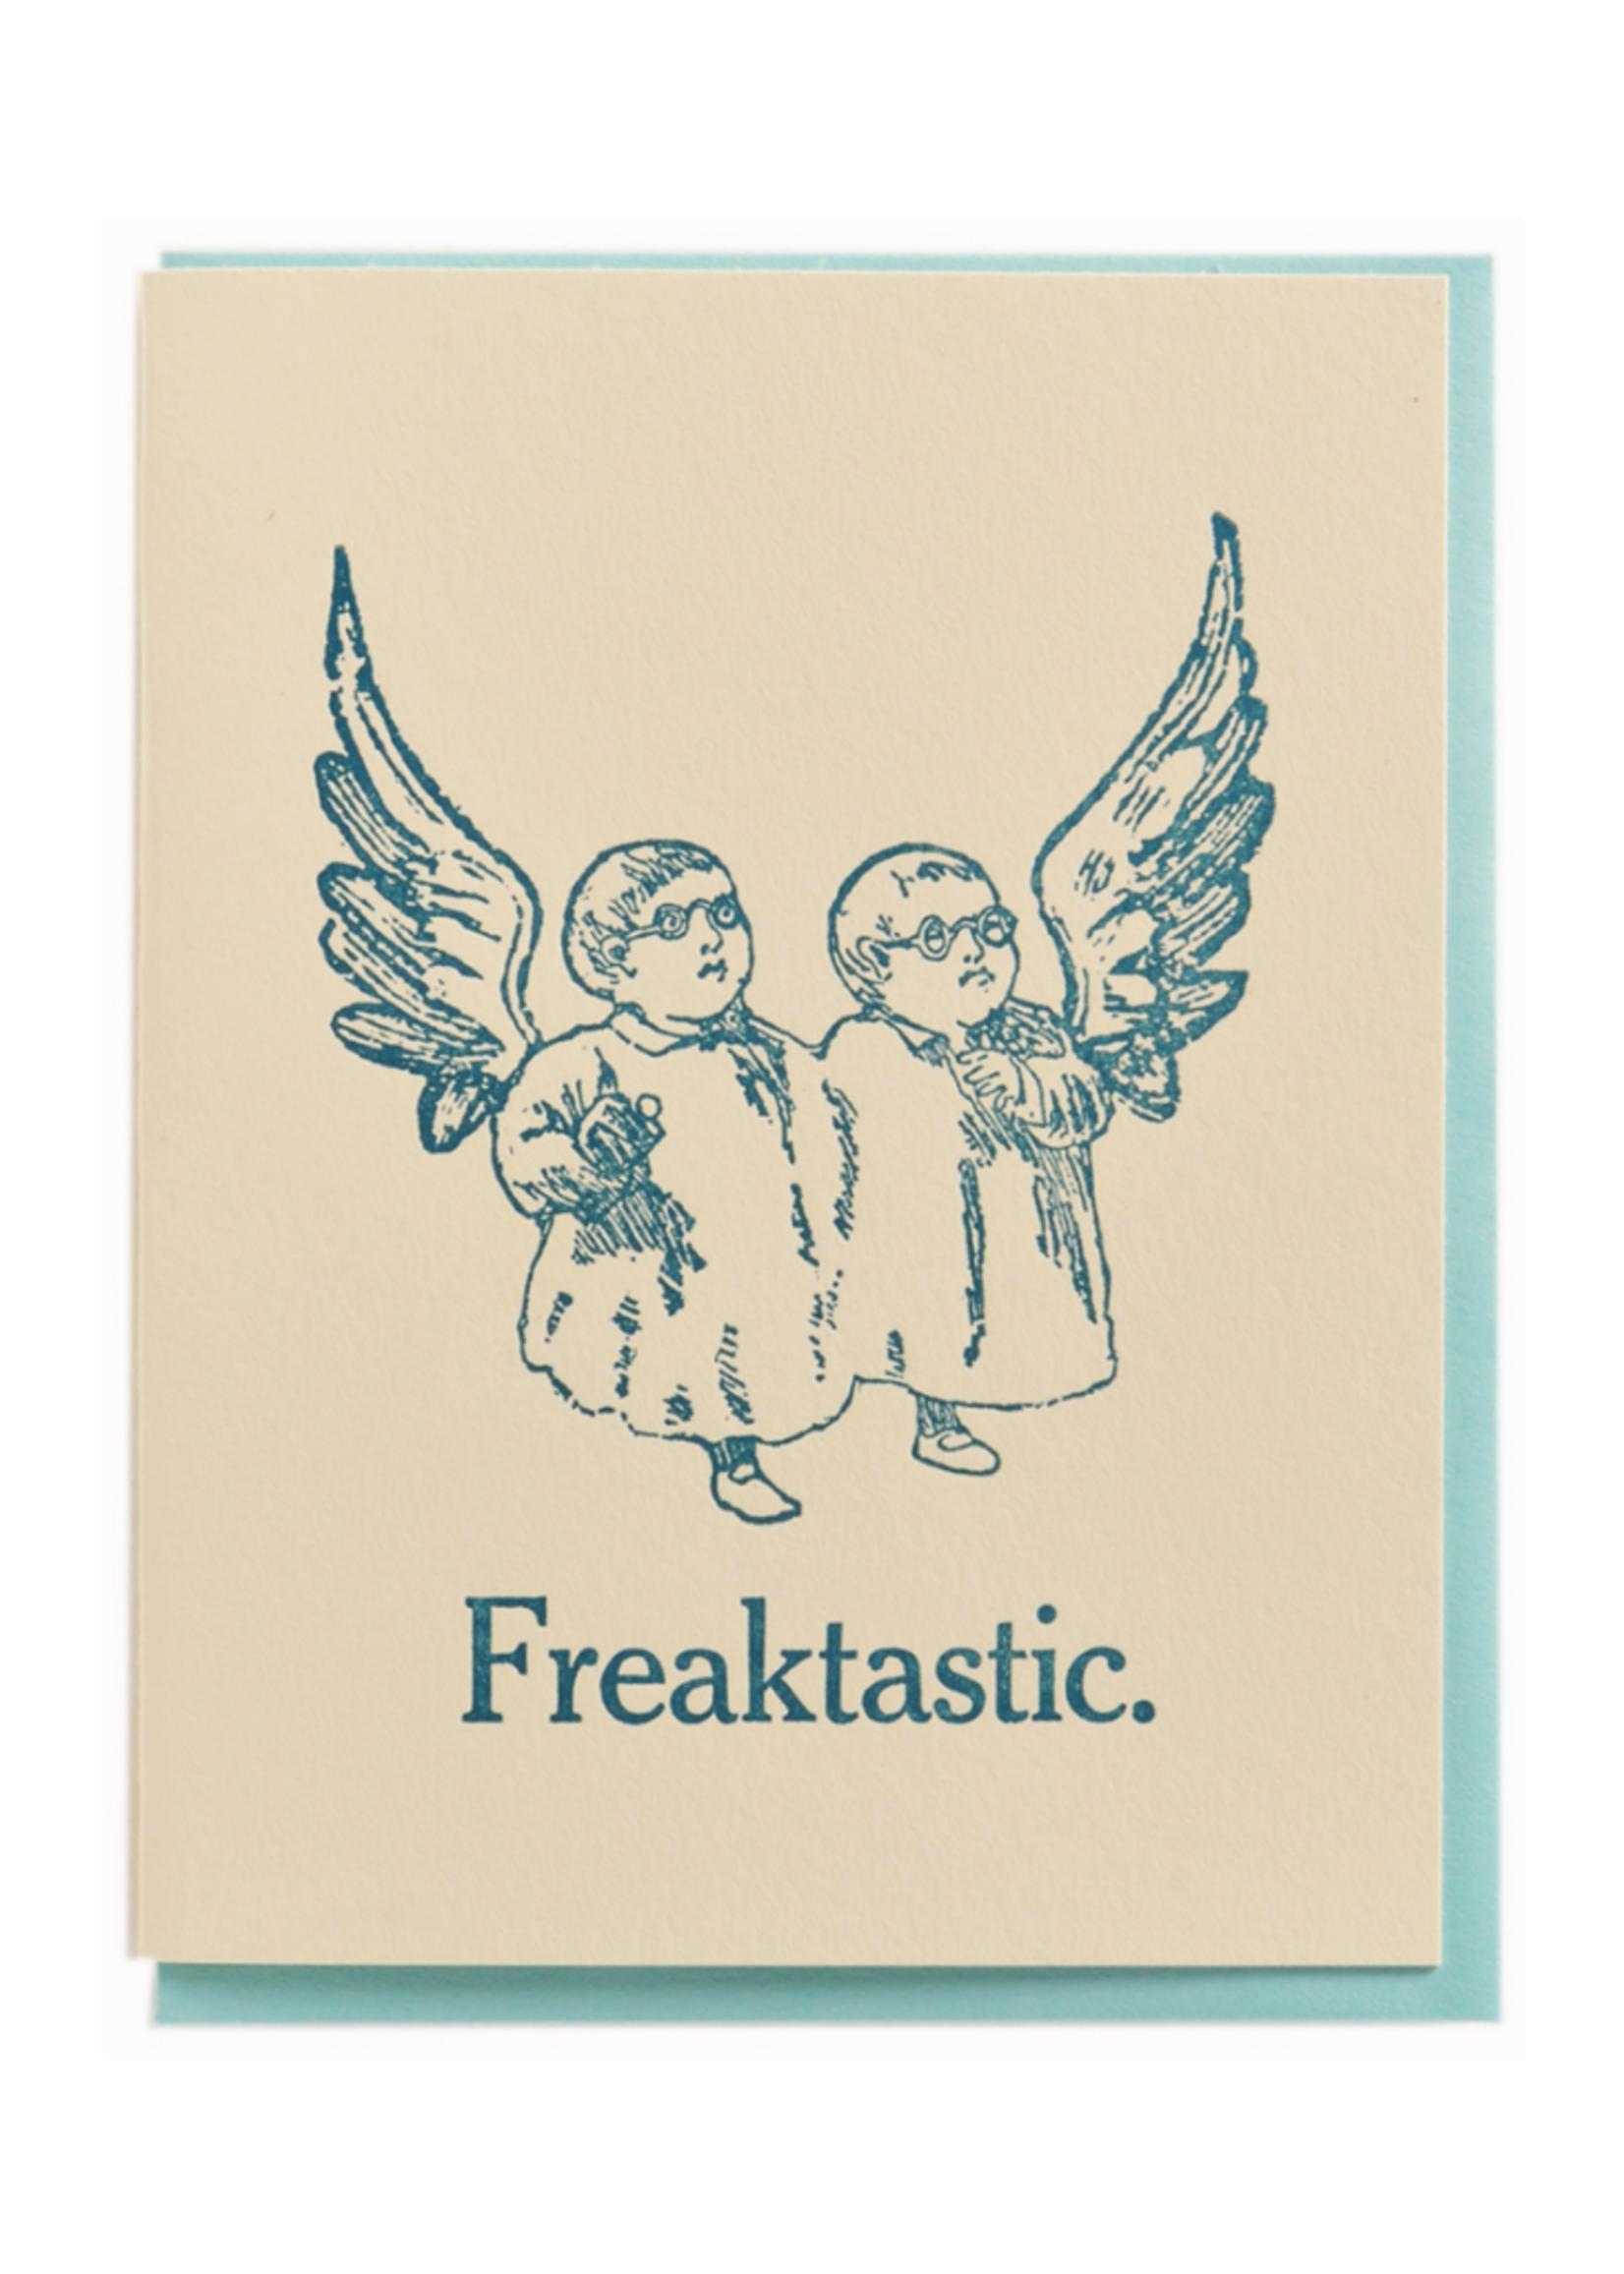 Zeichen Press Freaktastic Humorous Card